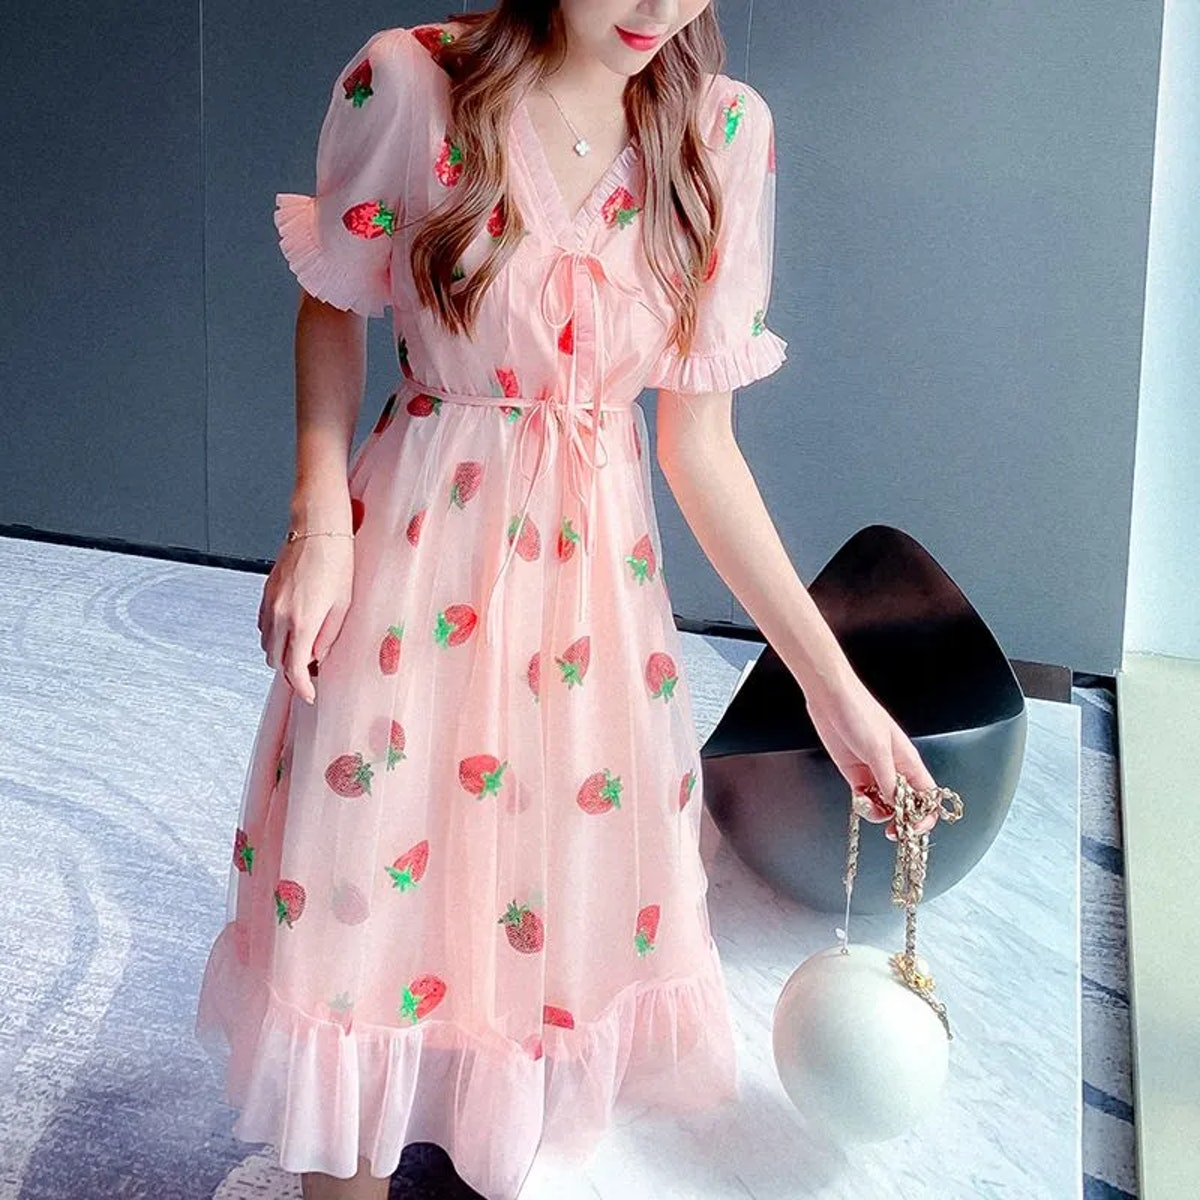 MePanda V-Neck Ruffle Trim Strawberry Printed Mesh Dress